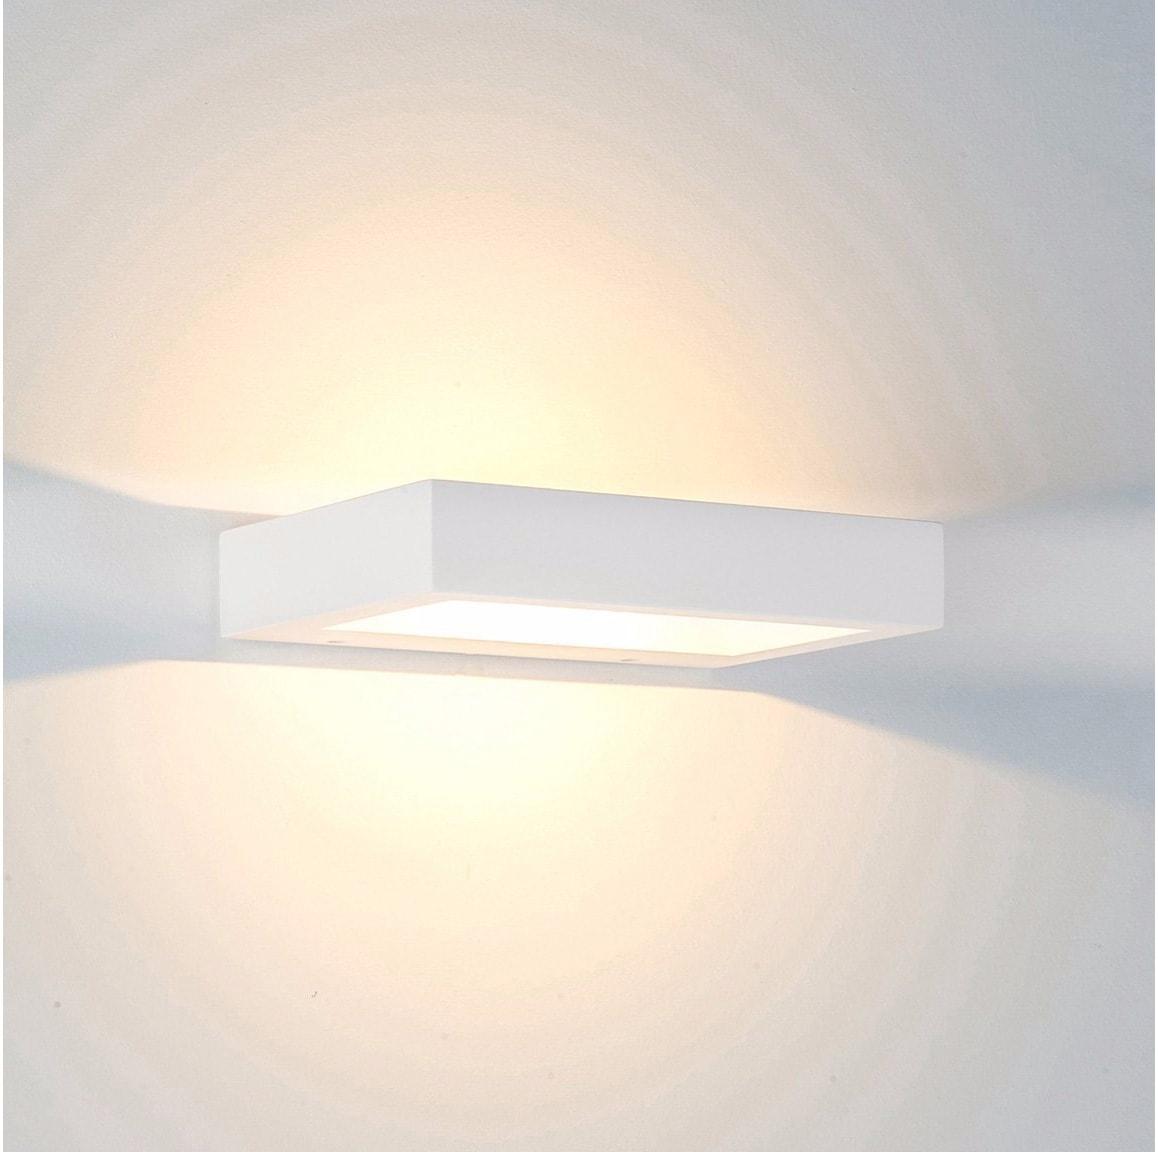 Havit Lighting LED Wandleuchte SHIMMER, Warmweiß